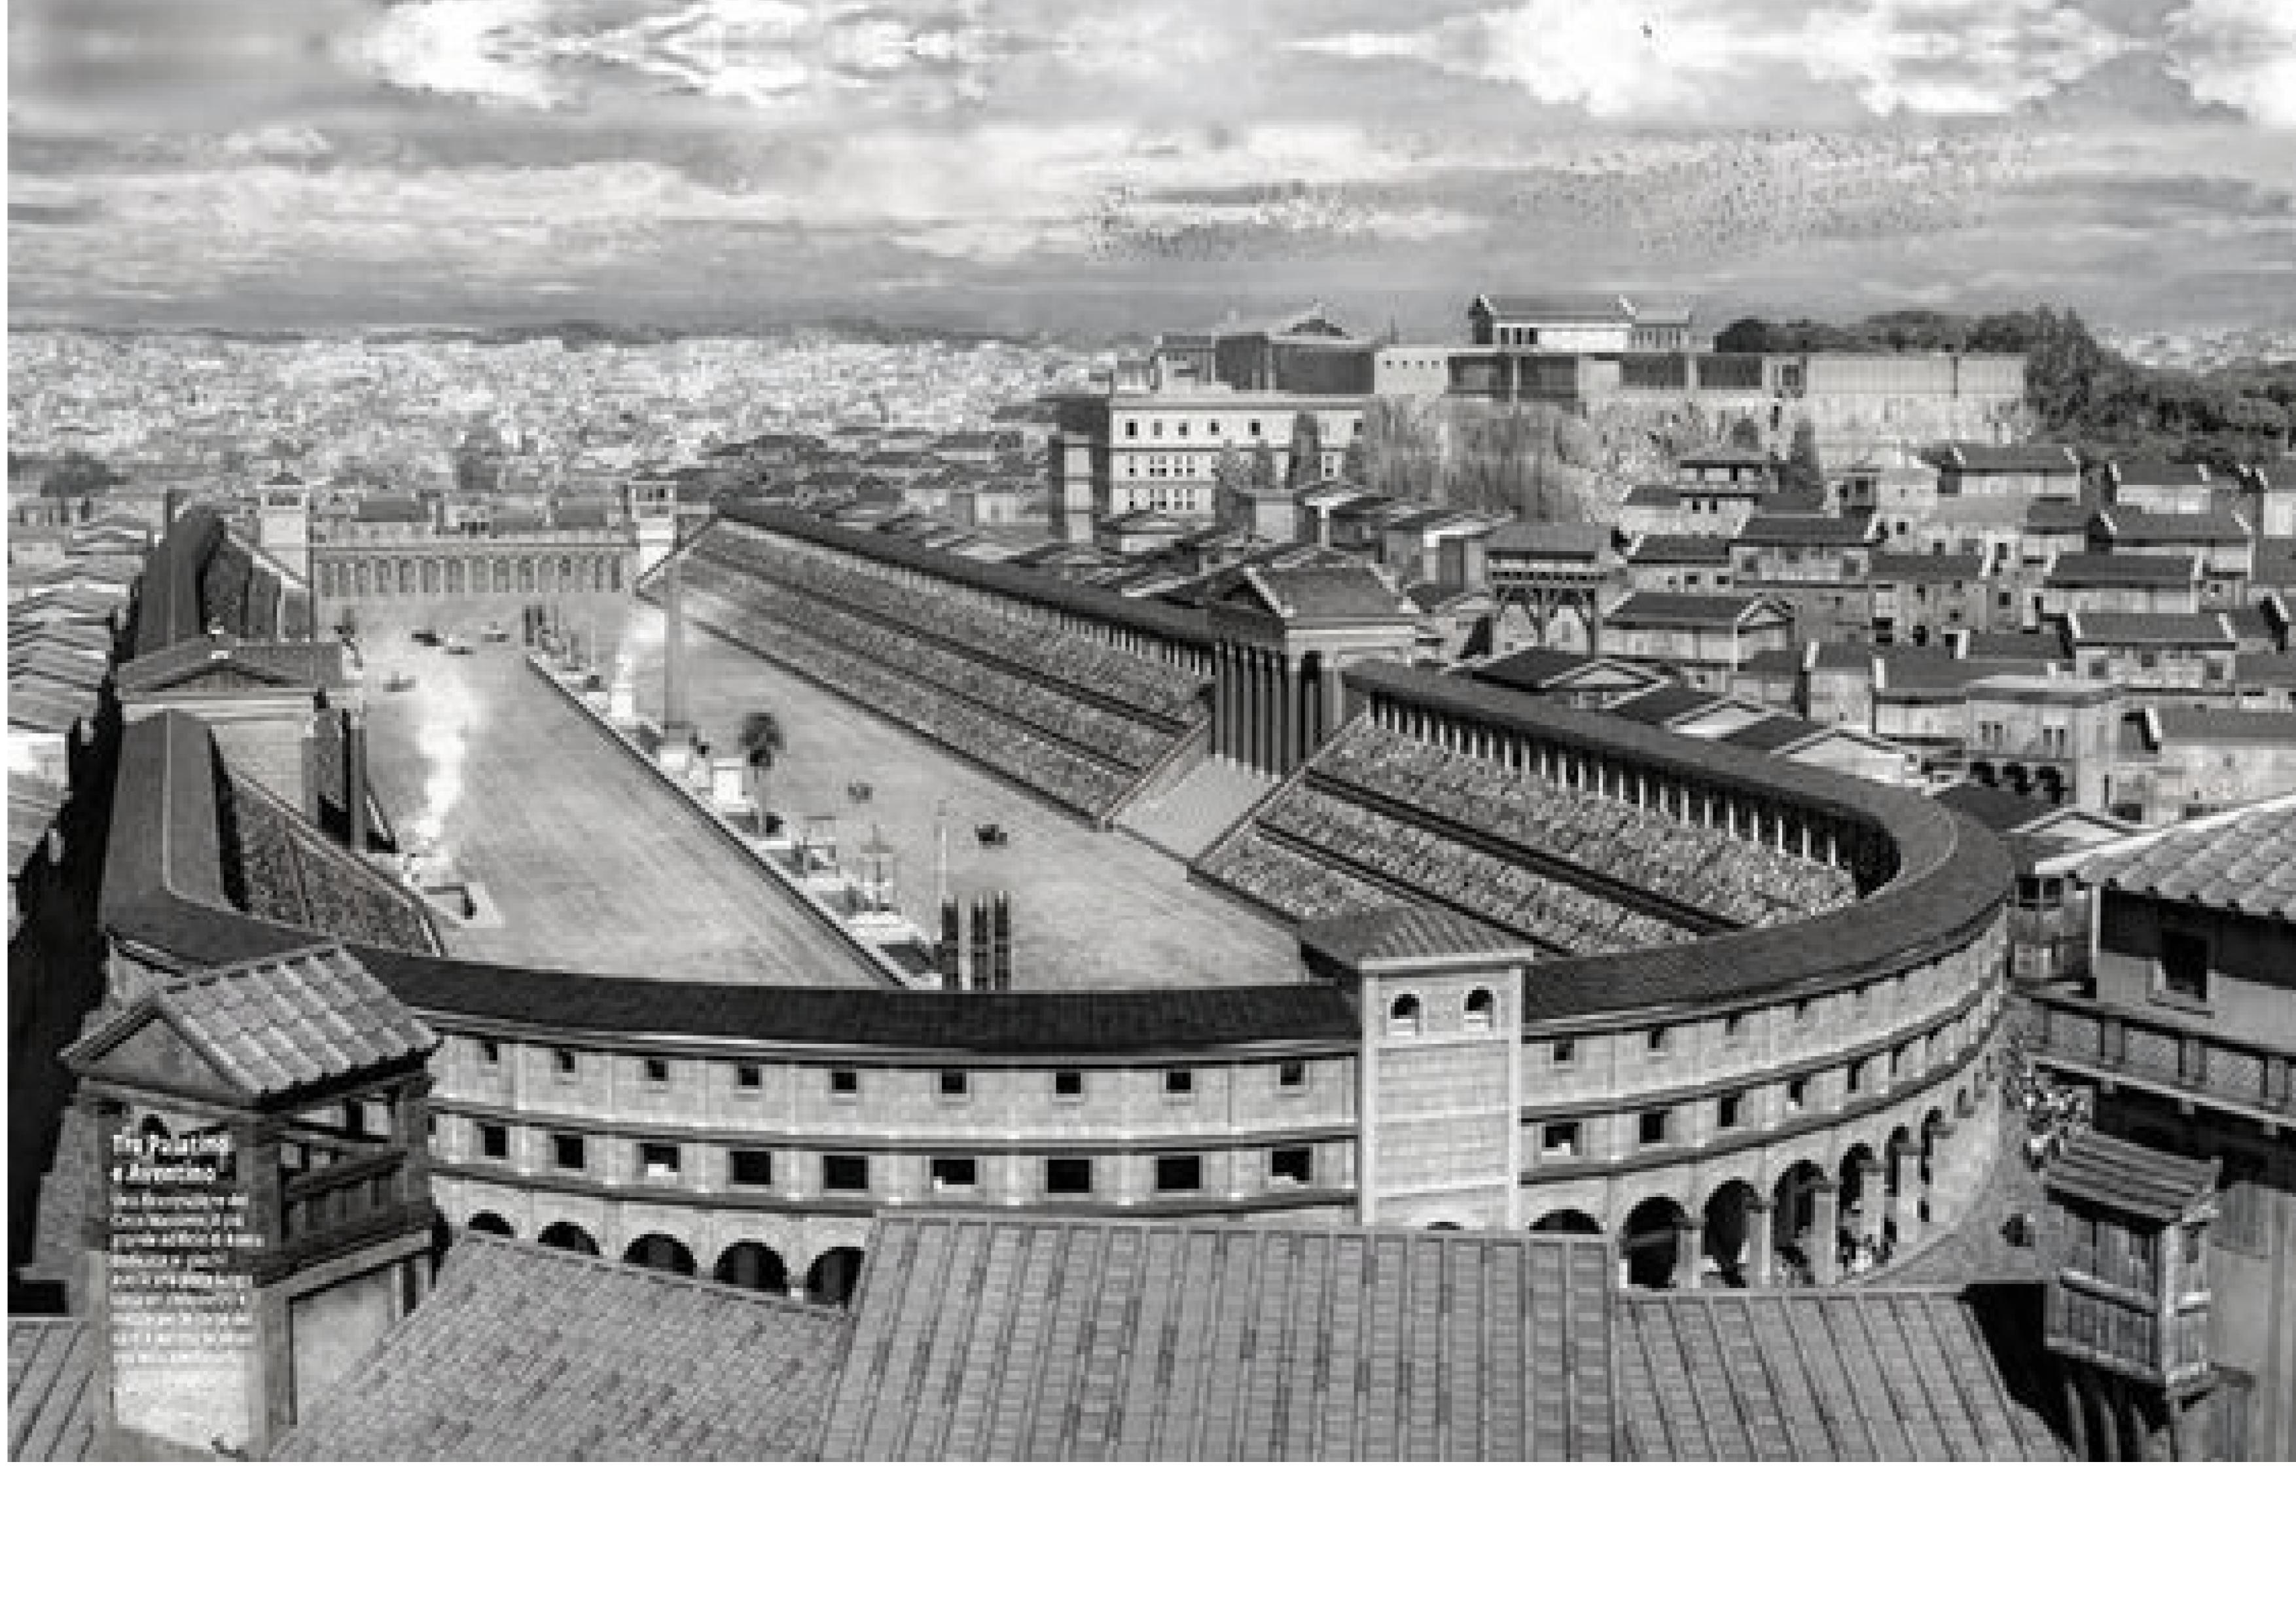 The Roman Circus